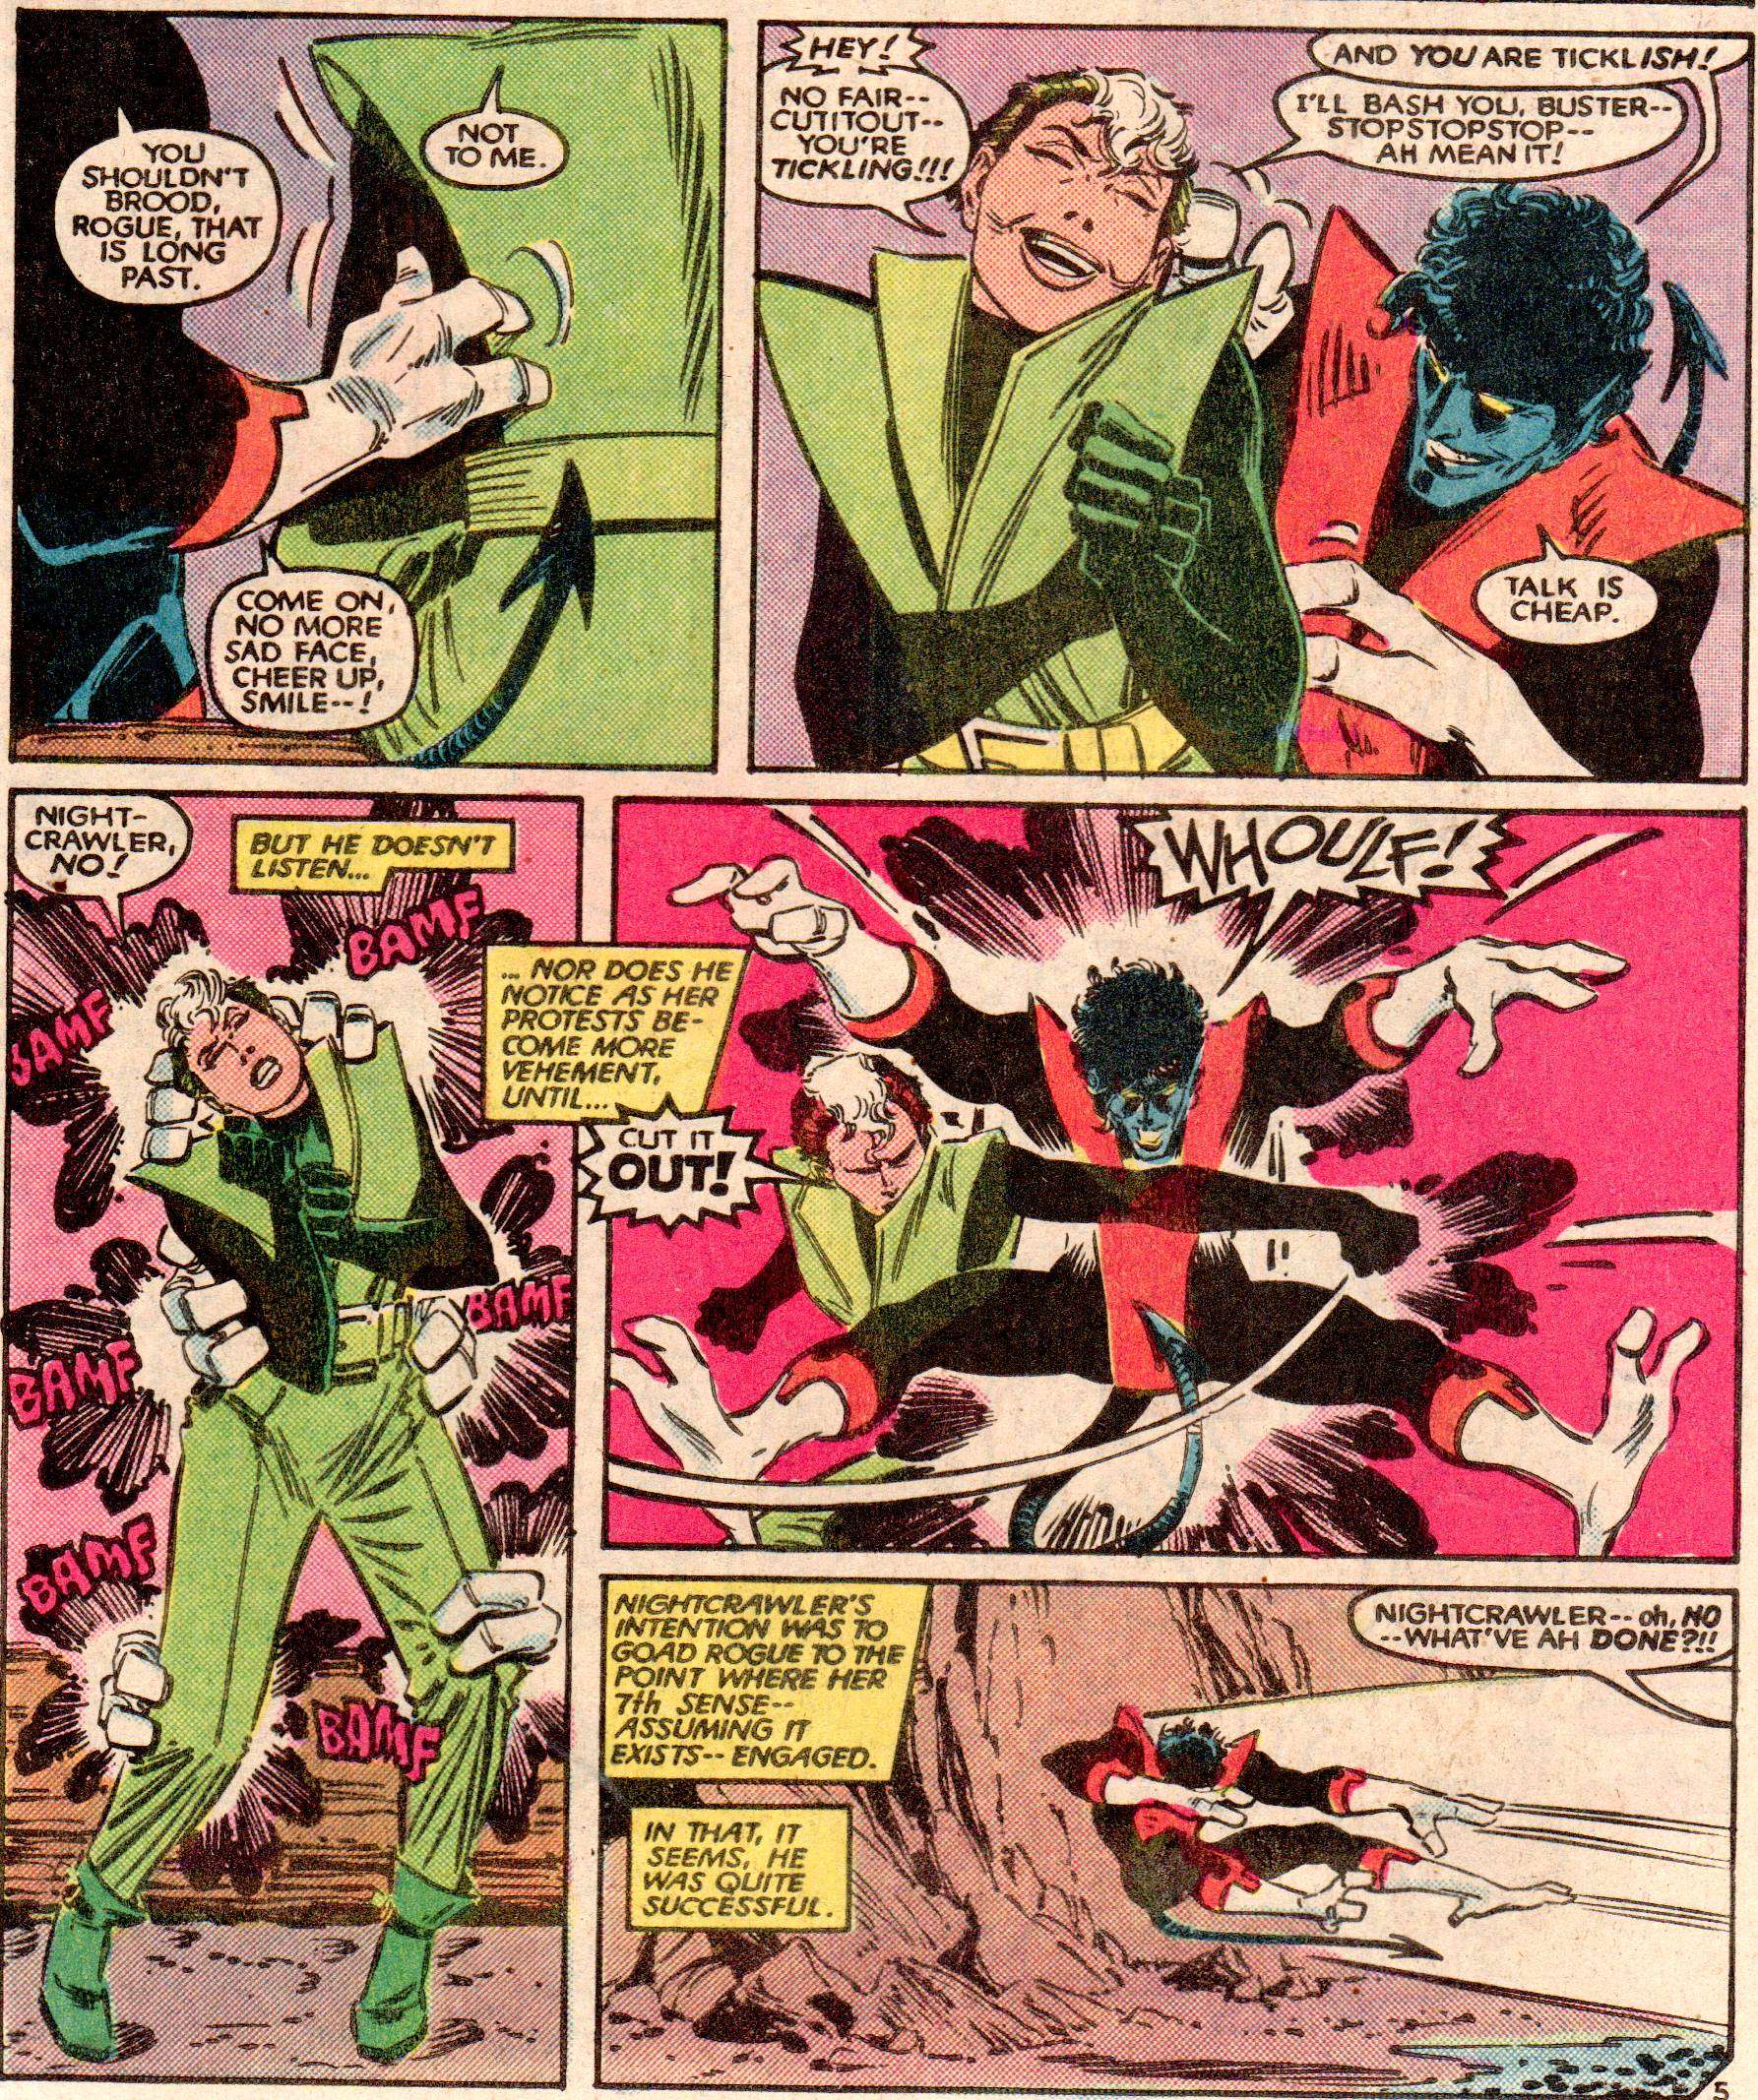 Comics You Should Own - 'Uncanny X-Men' #182-200 ⋆ Atomic Junk Shop